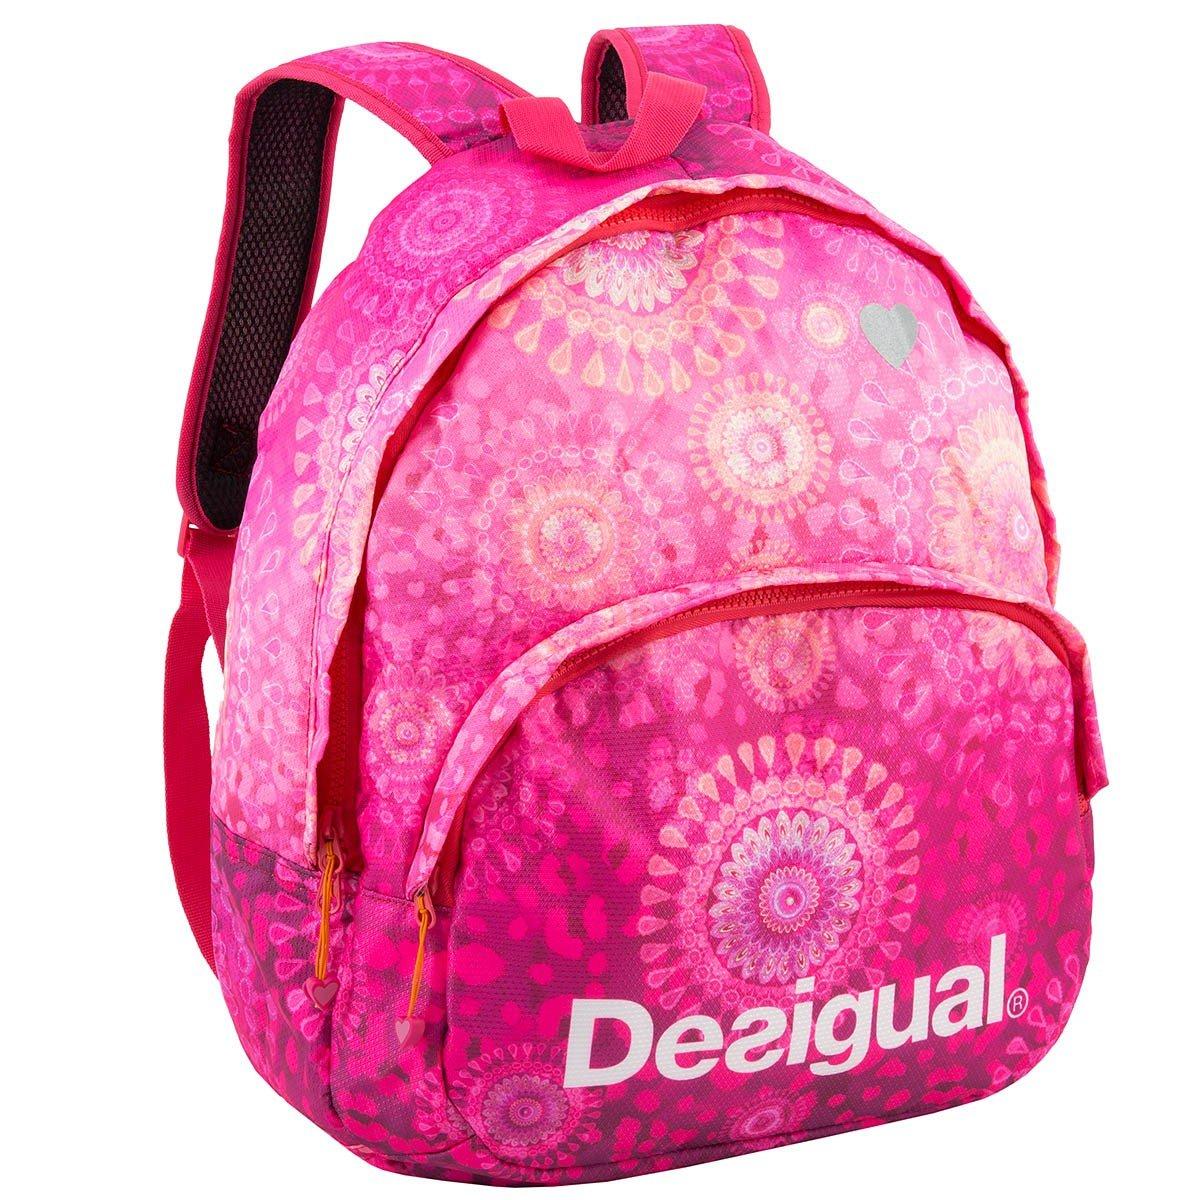 Desigual Sport Mujer mochila bag backpack Bols Ombita 5158 57x5SJ1x3177